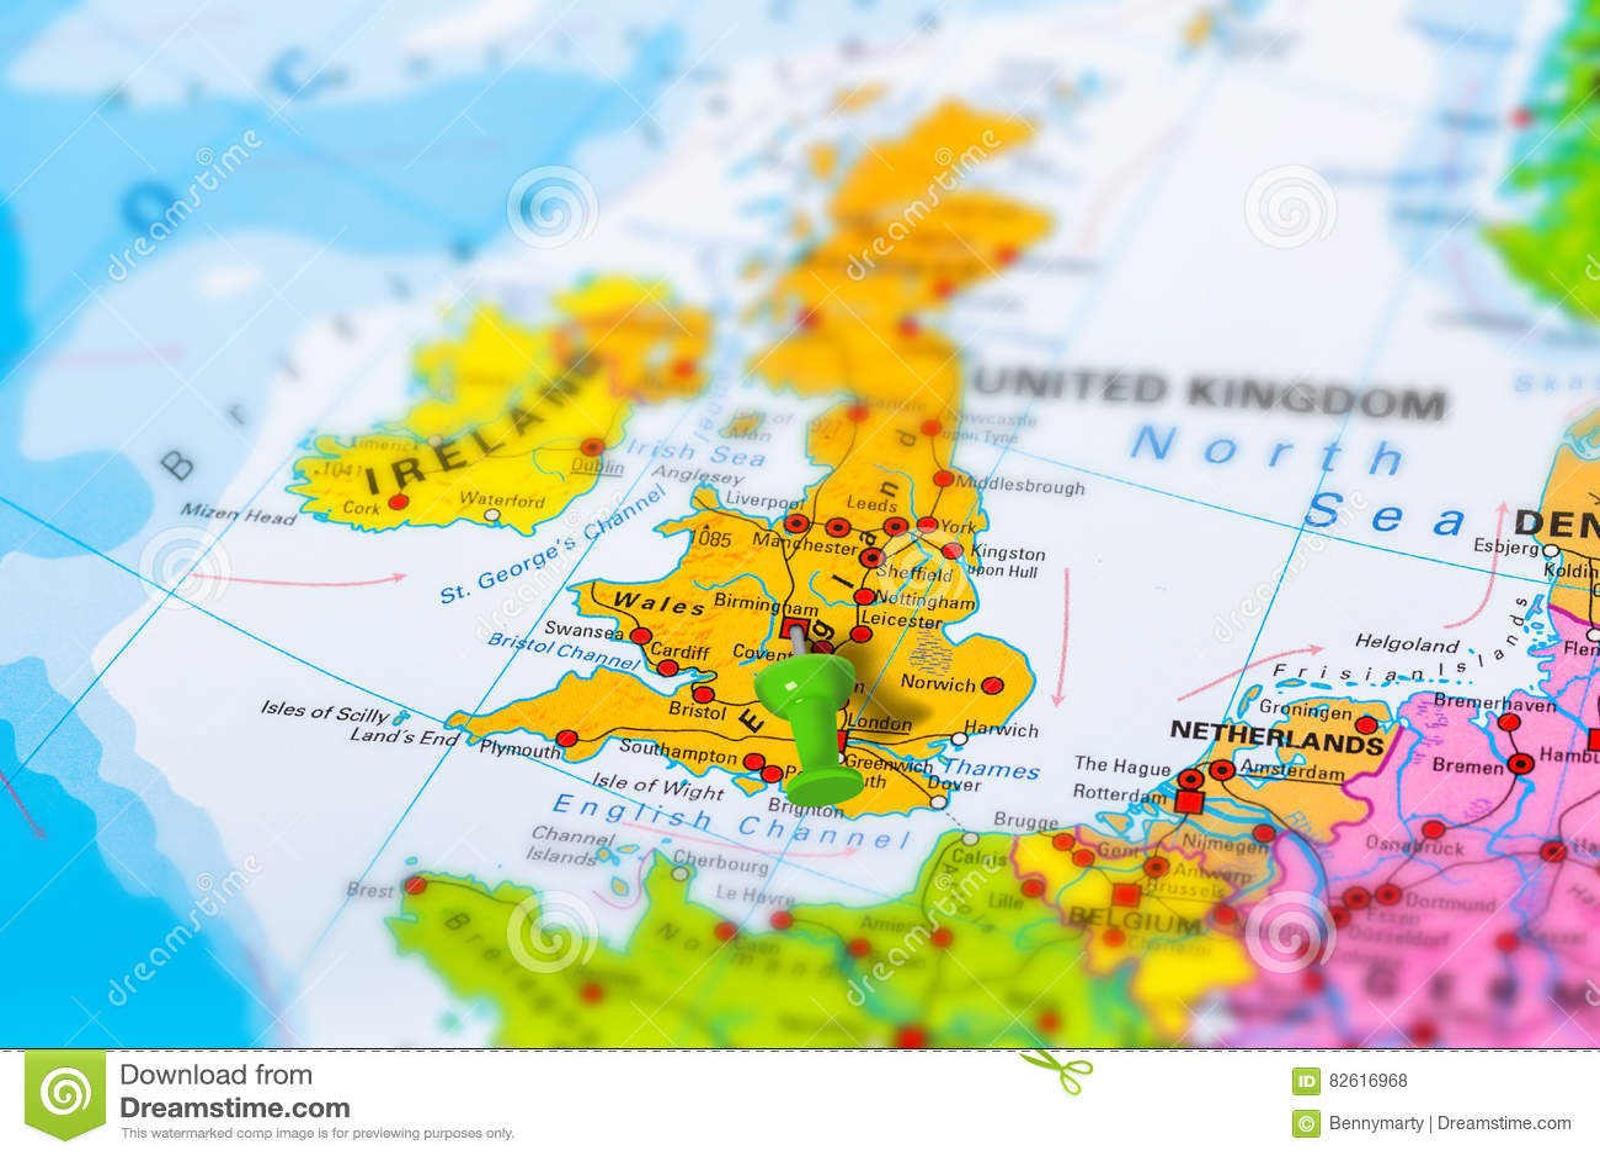 Map Of Uk In Europe.Birmingham Uk Map Stock Photo Image Of Europe Landmark 82616968